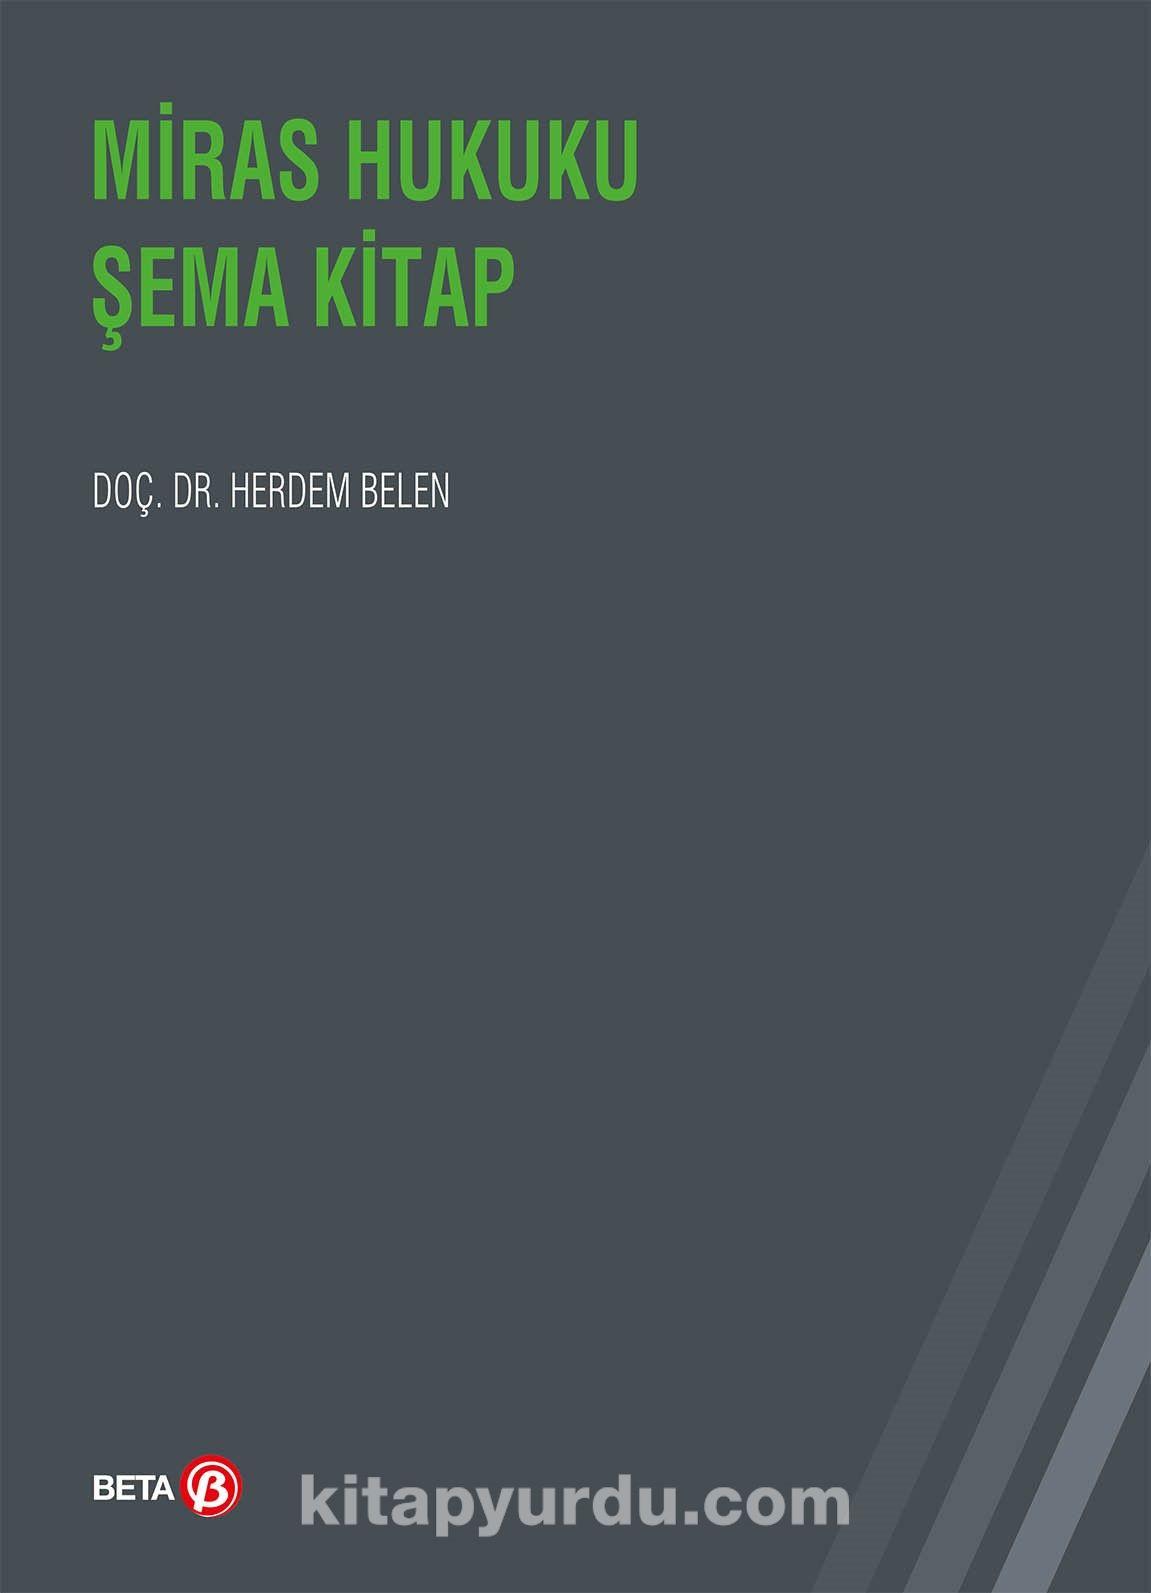 Miras Hukuku Şema Kitap - Dr. Herdem Belen pdf epub